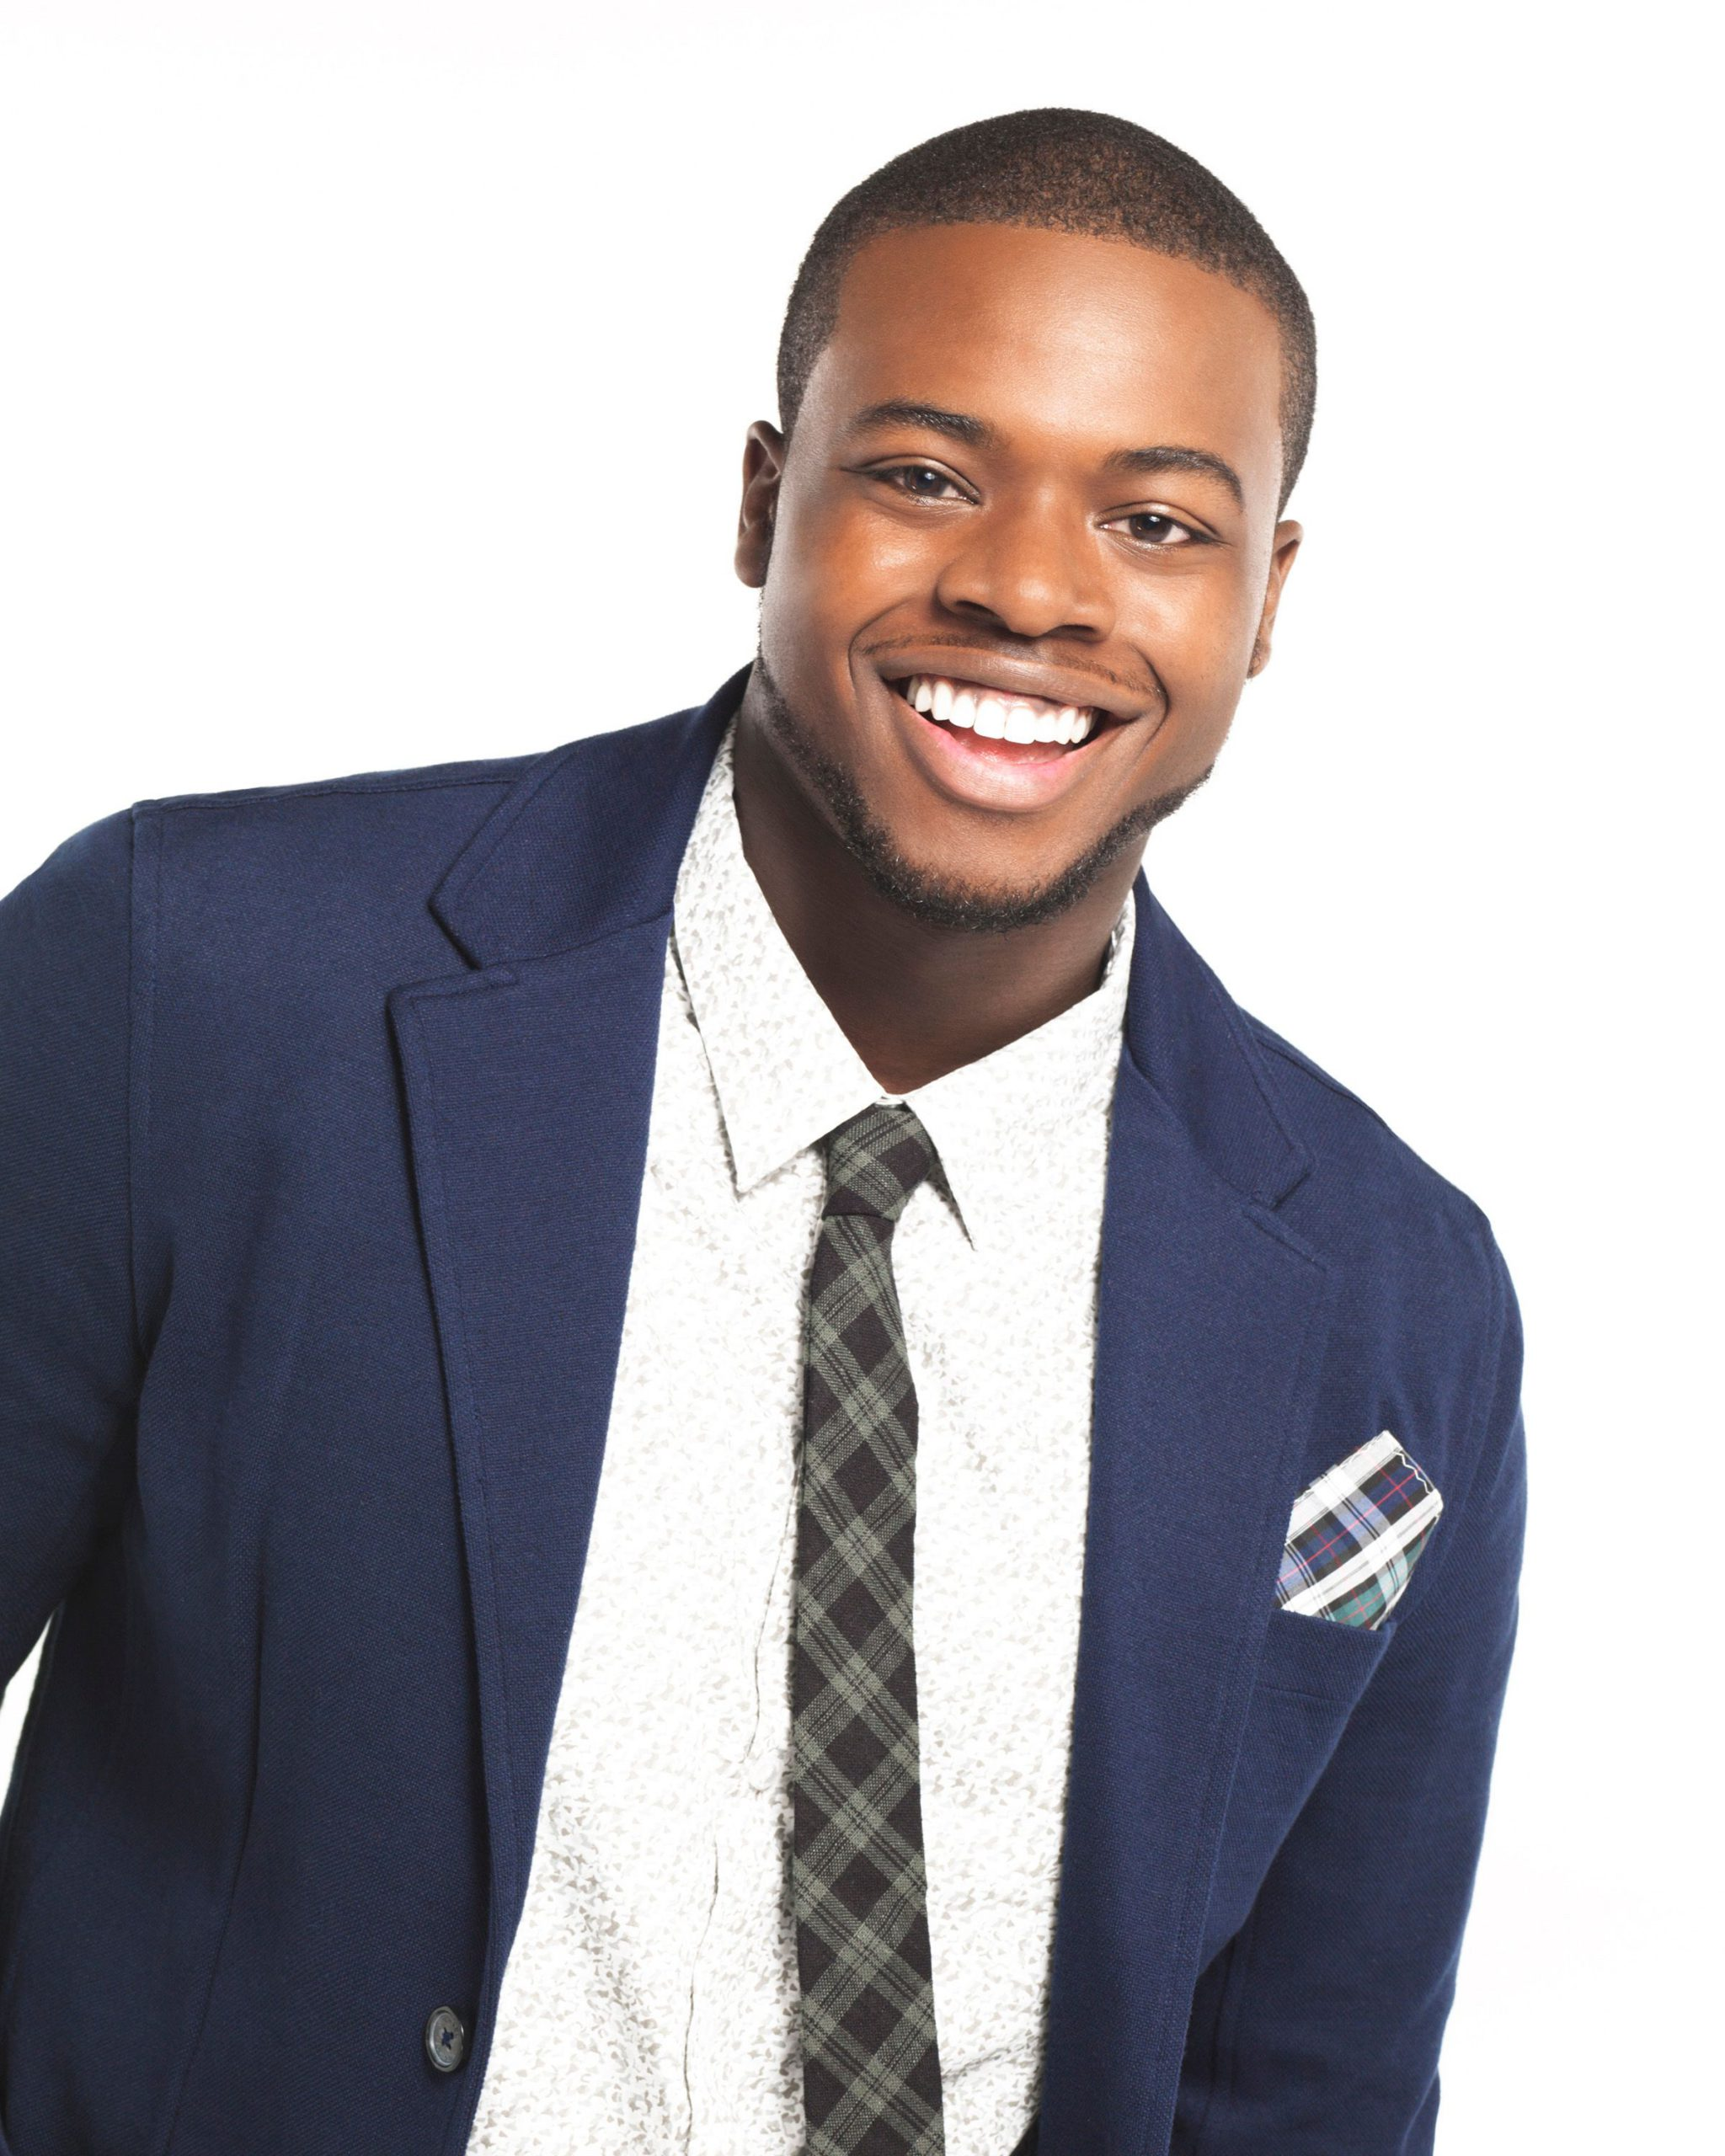 Kevin-Olusola-speaker